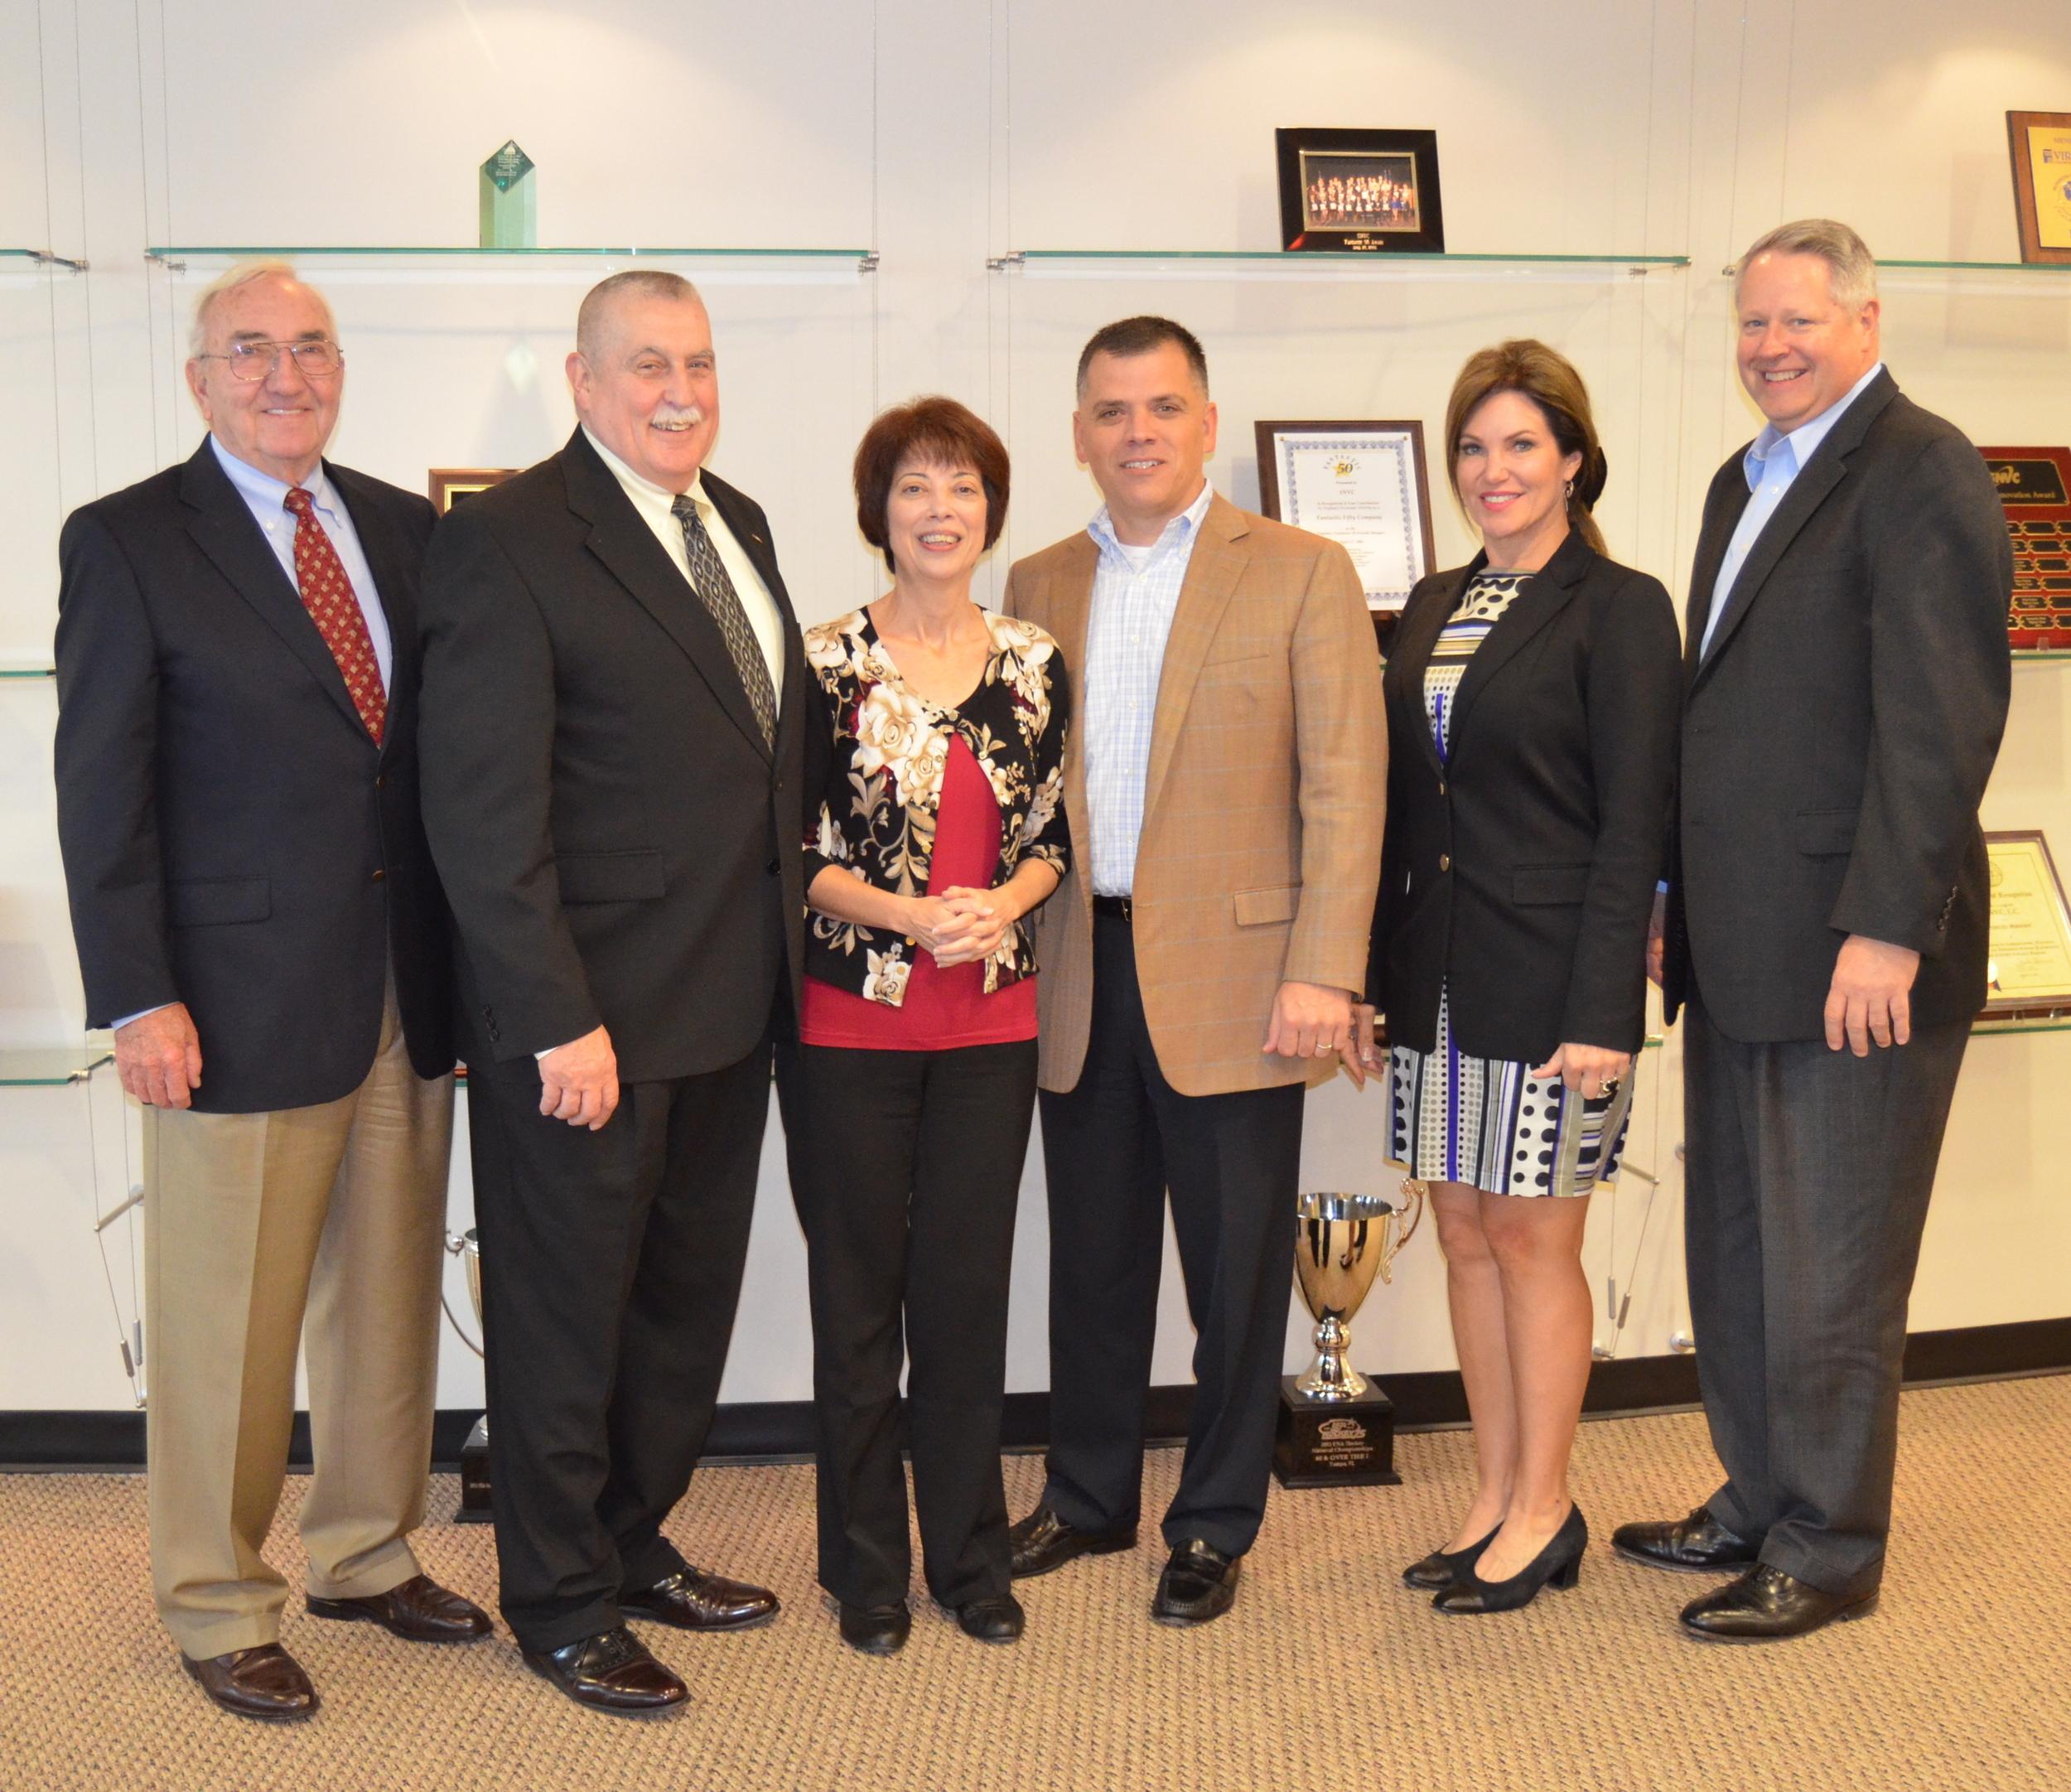 From Left: Board Members Ron Griffith, Tom Leavitt, UNC Representative  Ann Marie Beall, Board Members Mike Johnson, Lisa Spoden, and Tom DeWitt